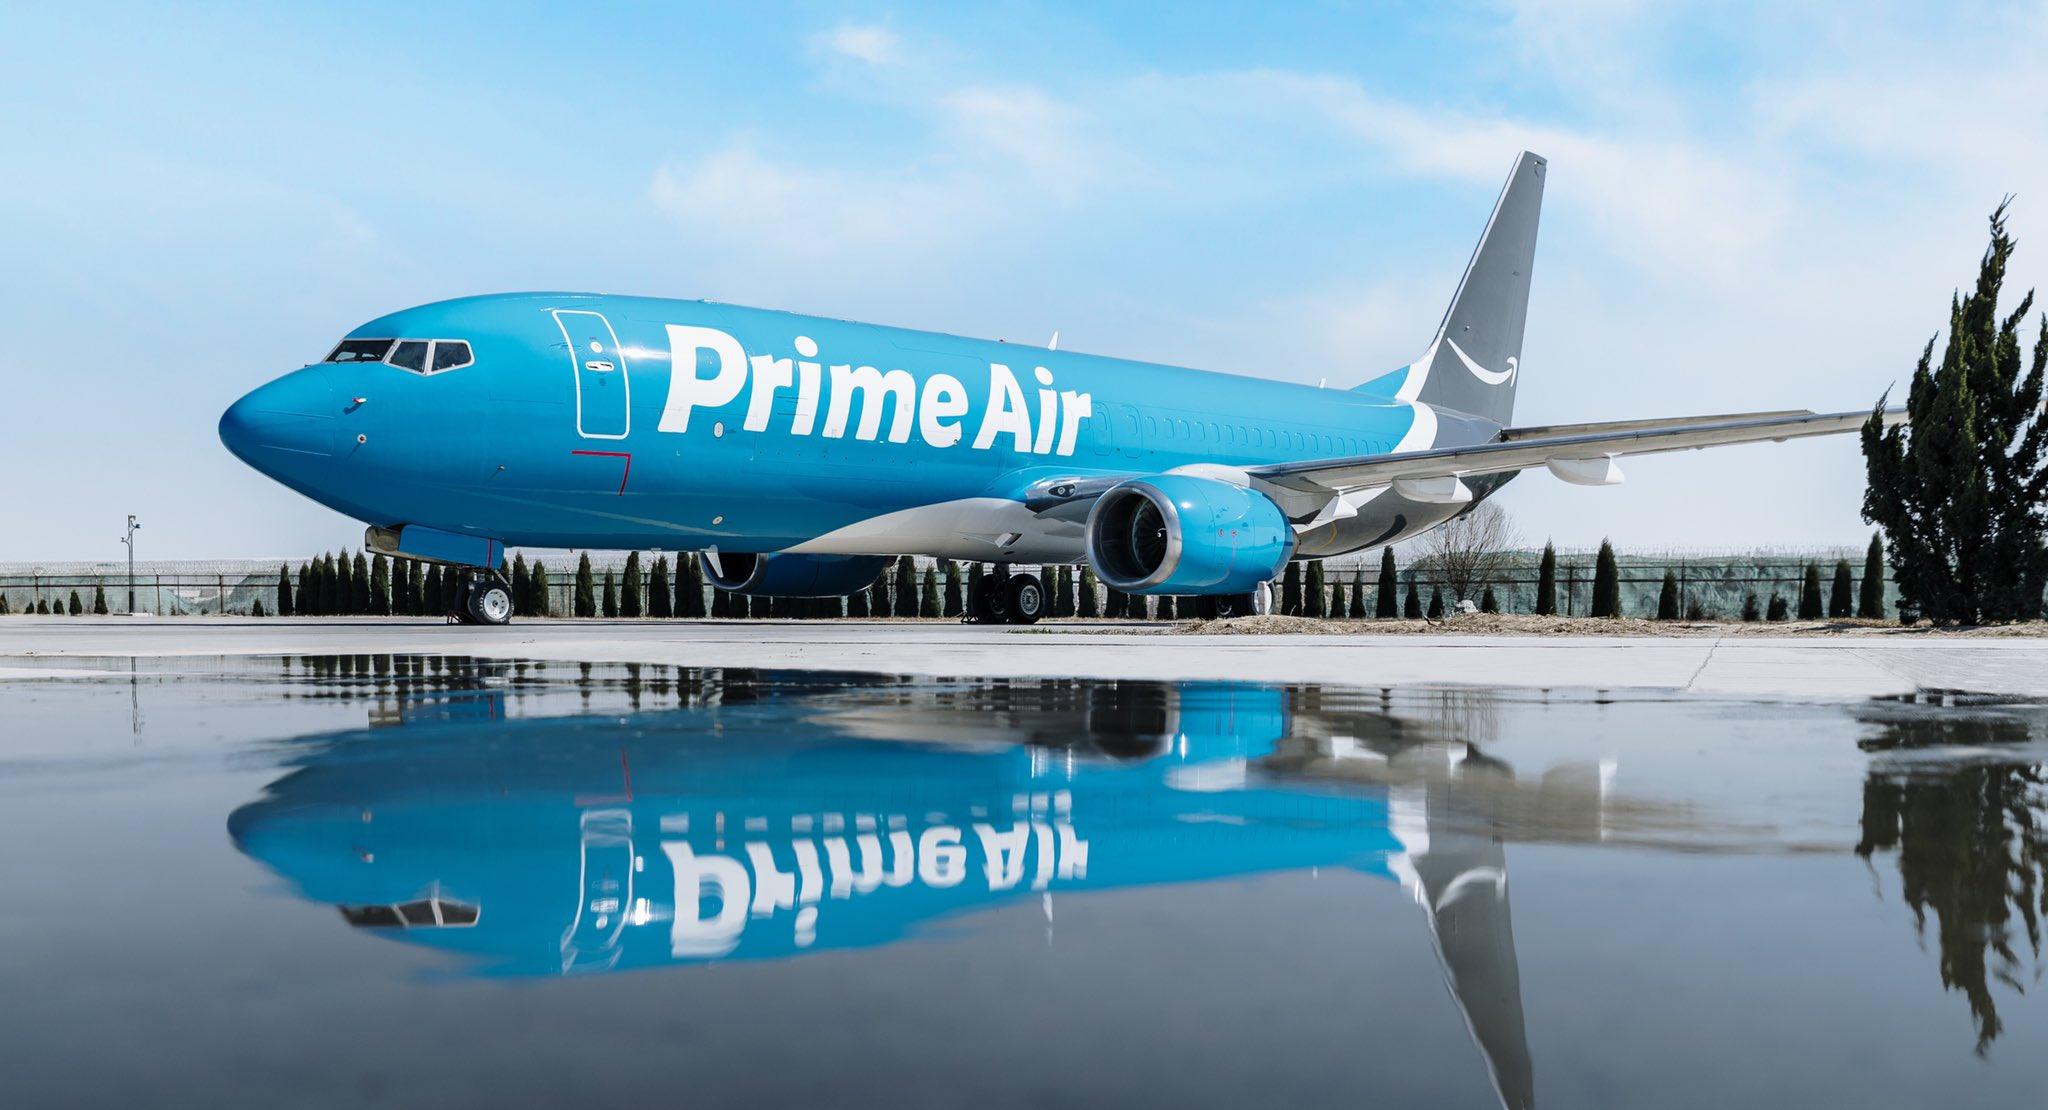 An Amazon Prime Air jet on the tarmac.